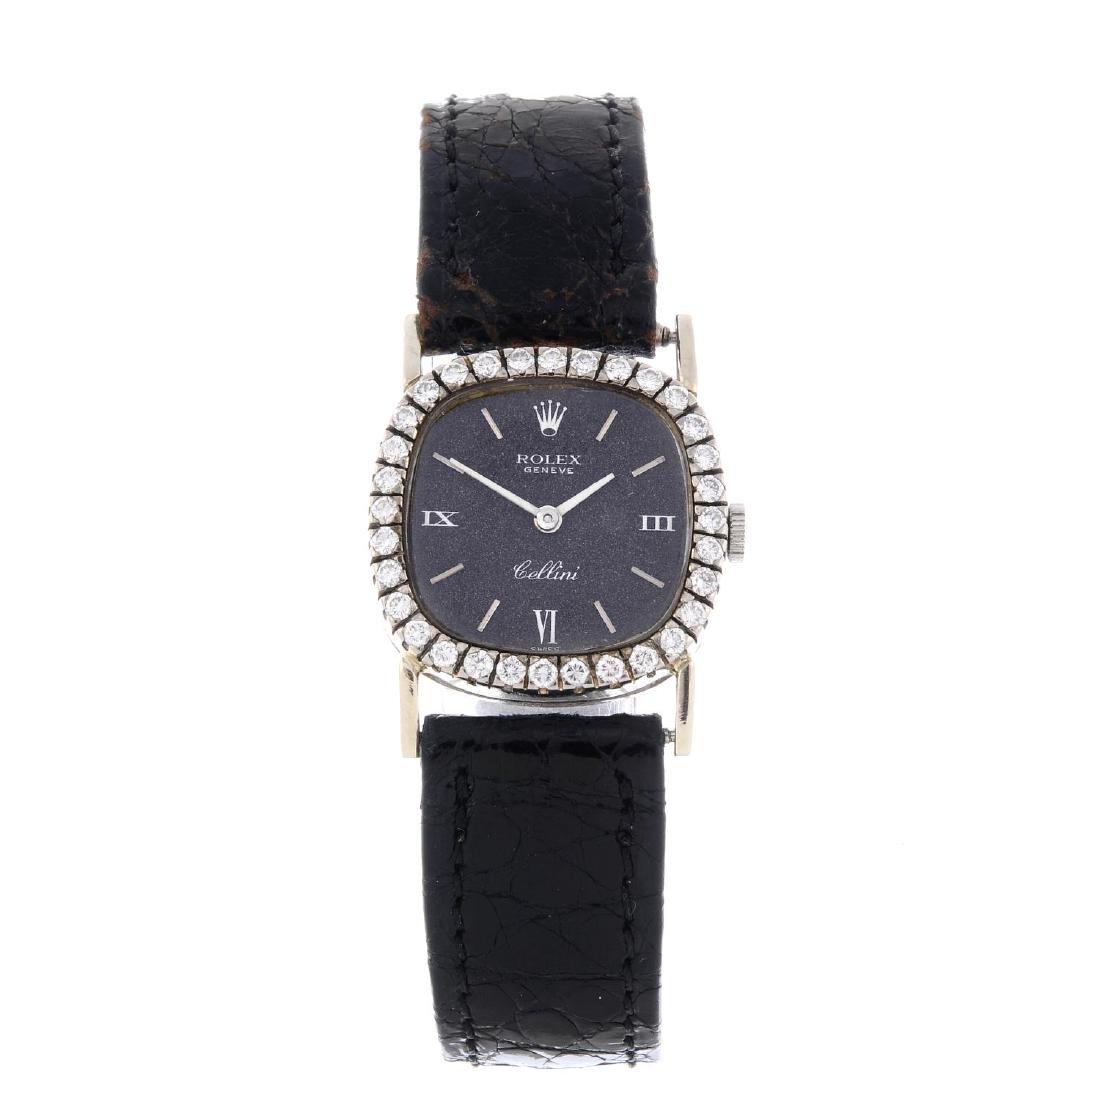 ROLEX - a lady's Cellini wrist watch. Circa 1969. White